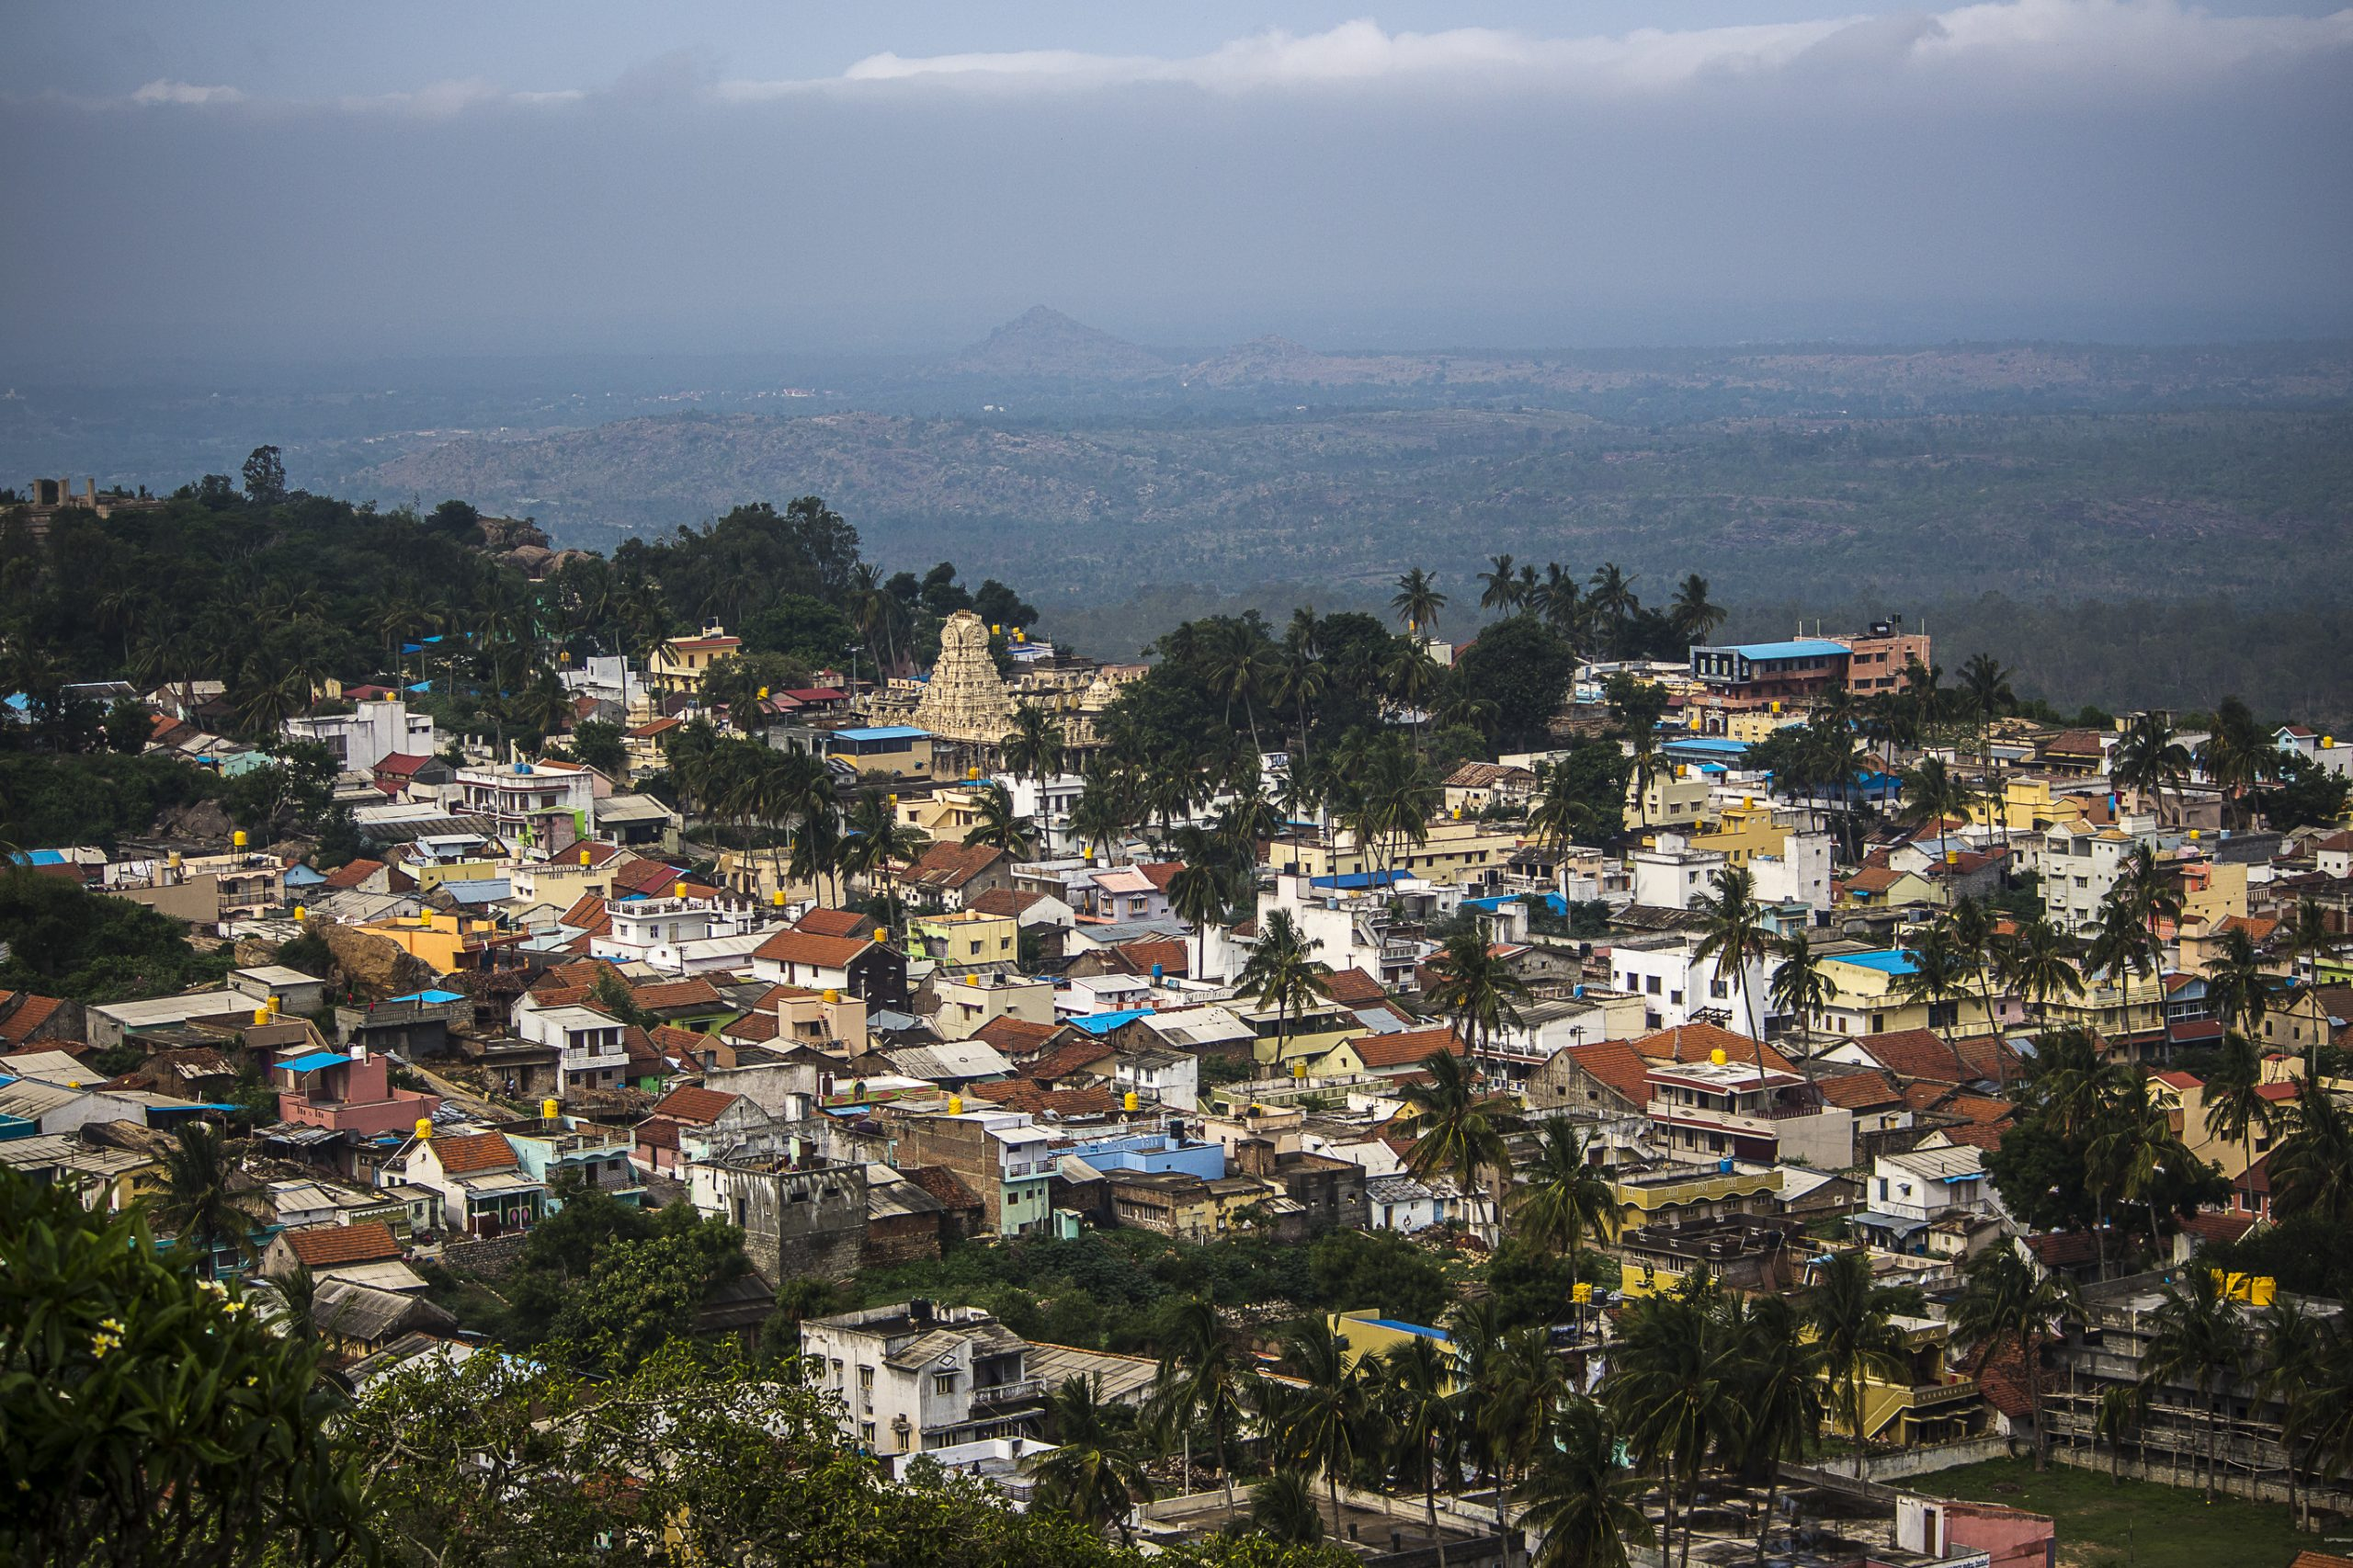 A view of Melukote Town in Karnataka